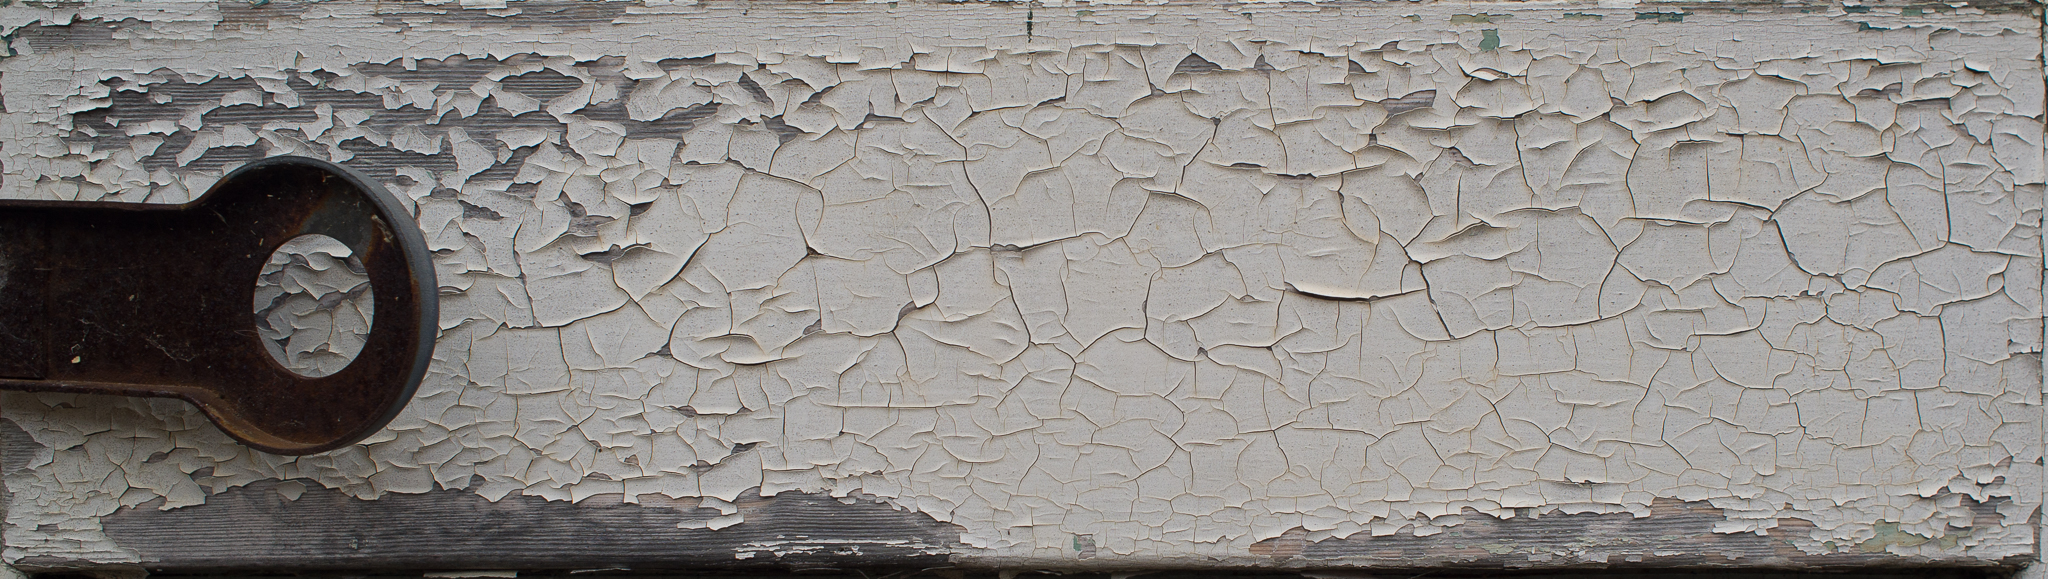 PaintCracked--2.jpg